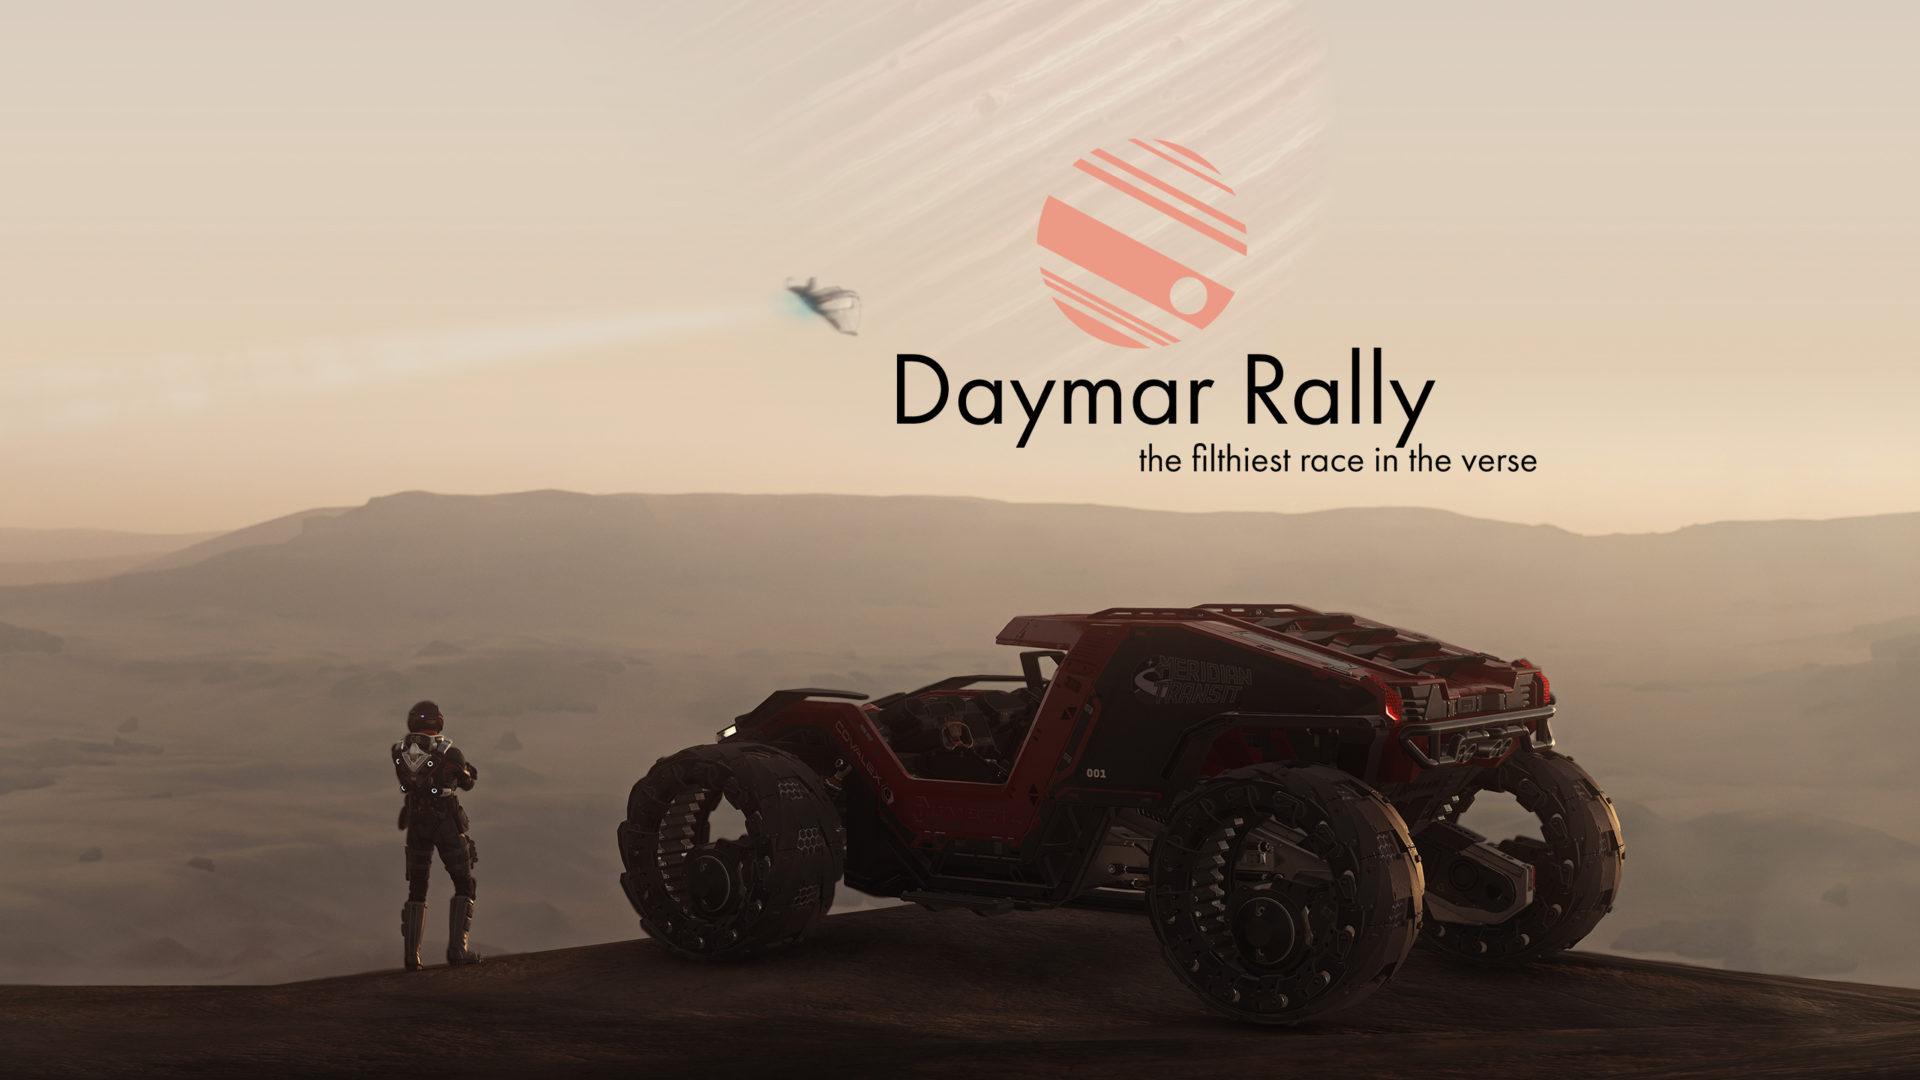 Daymar Rally 'Take Your Marks' Teaser thumb